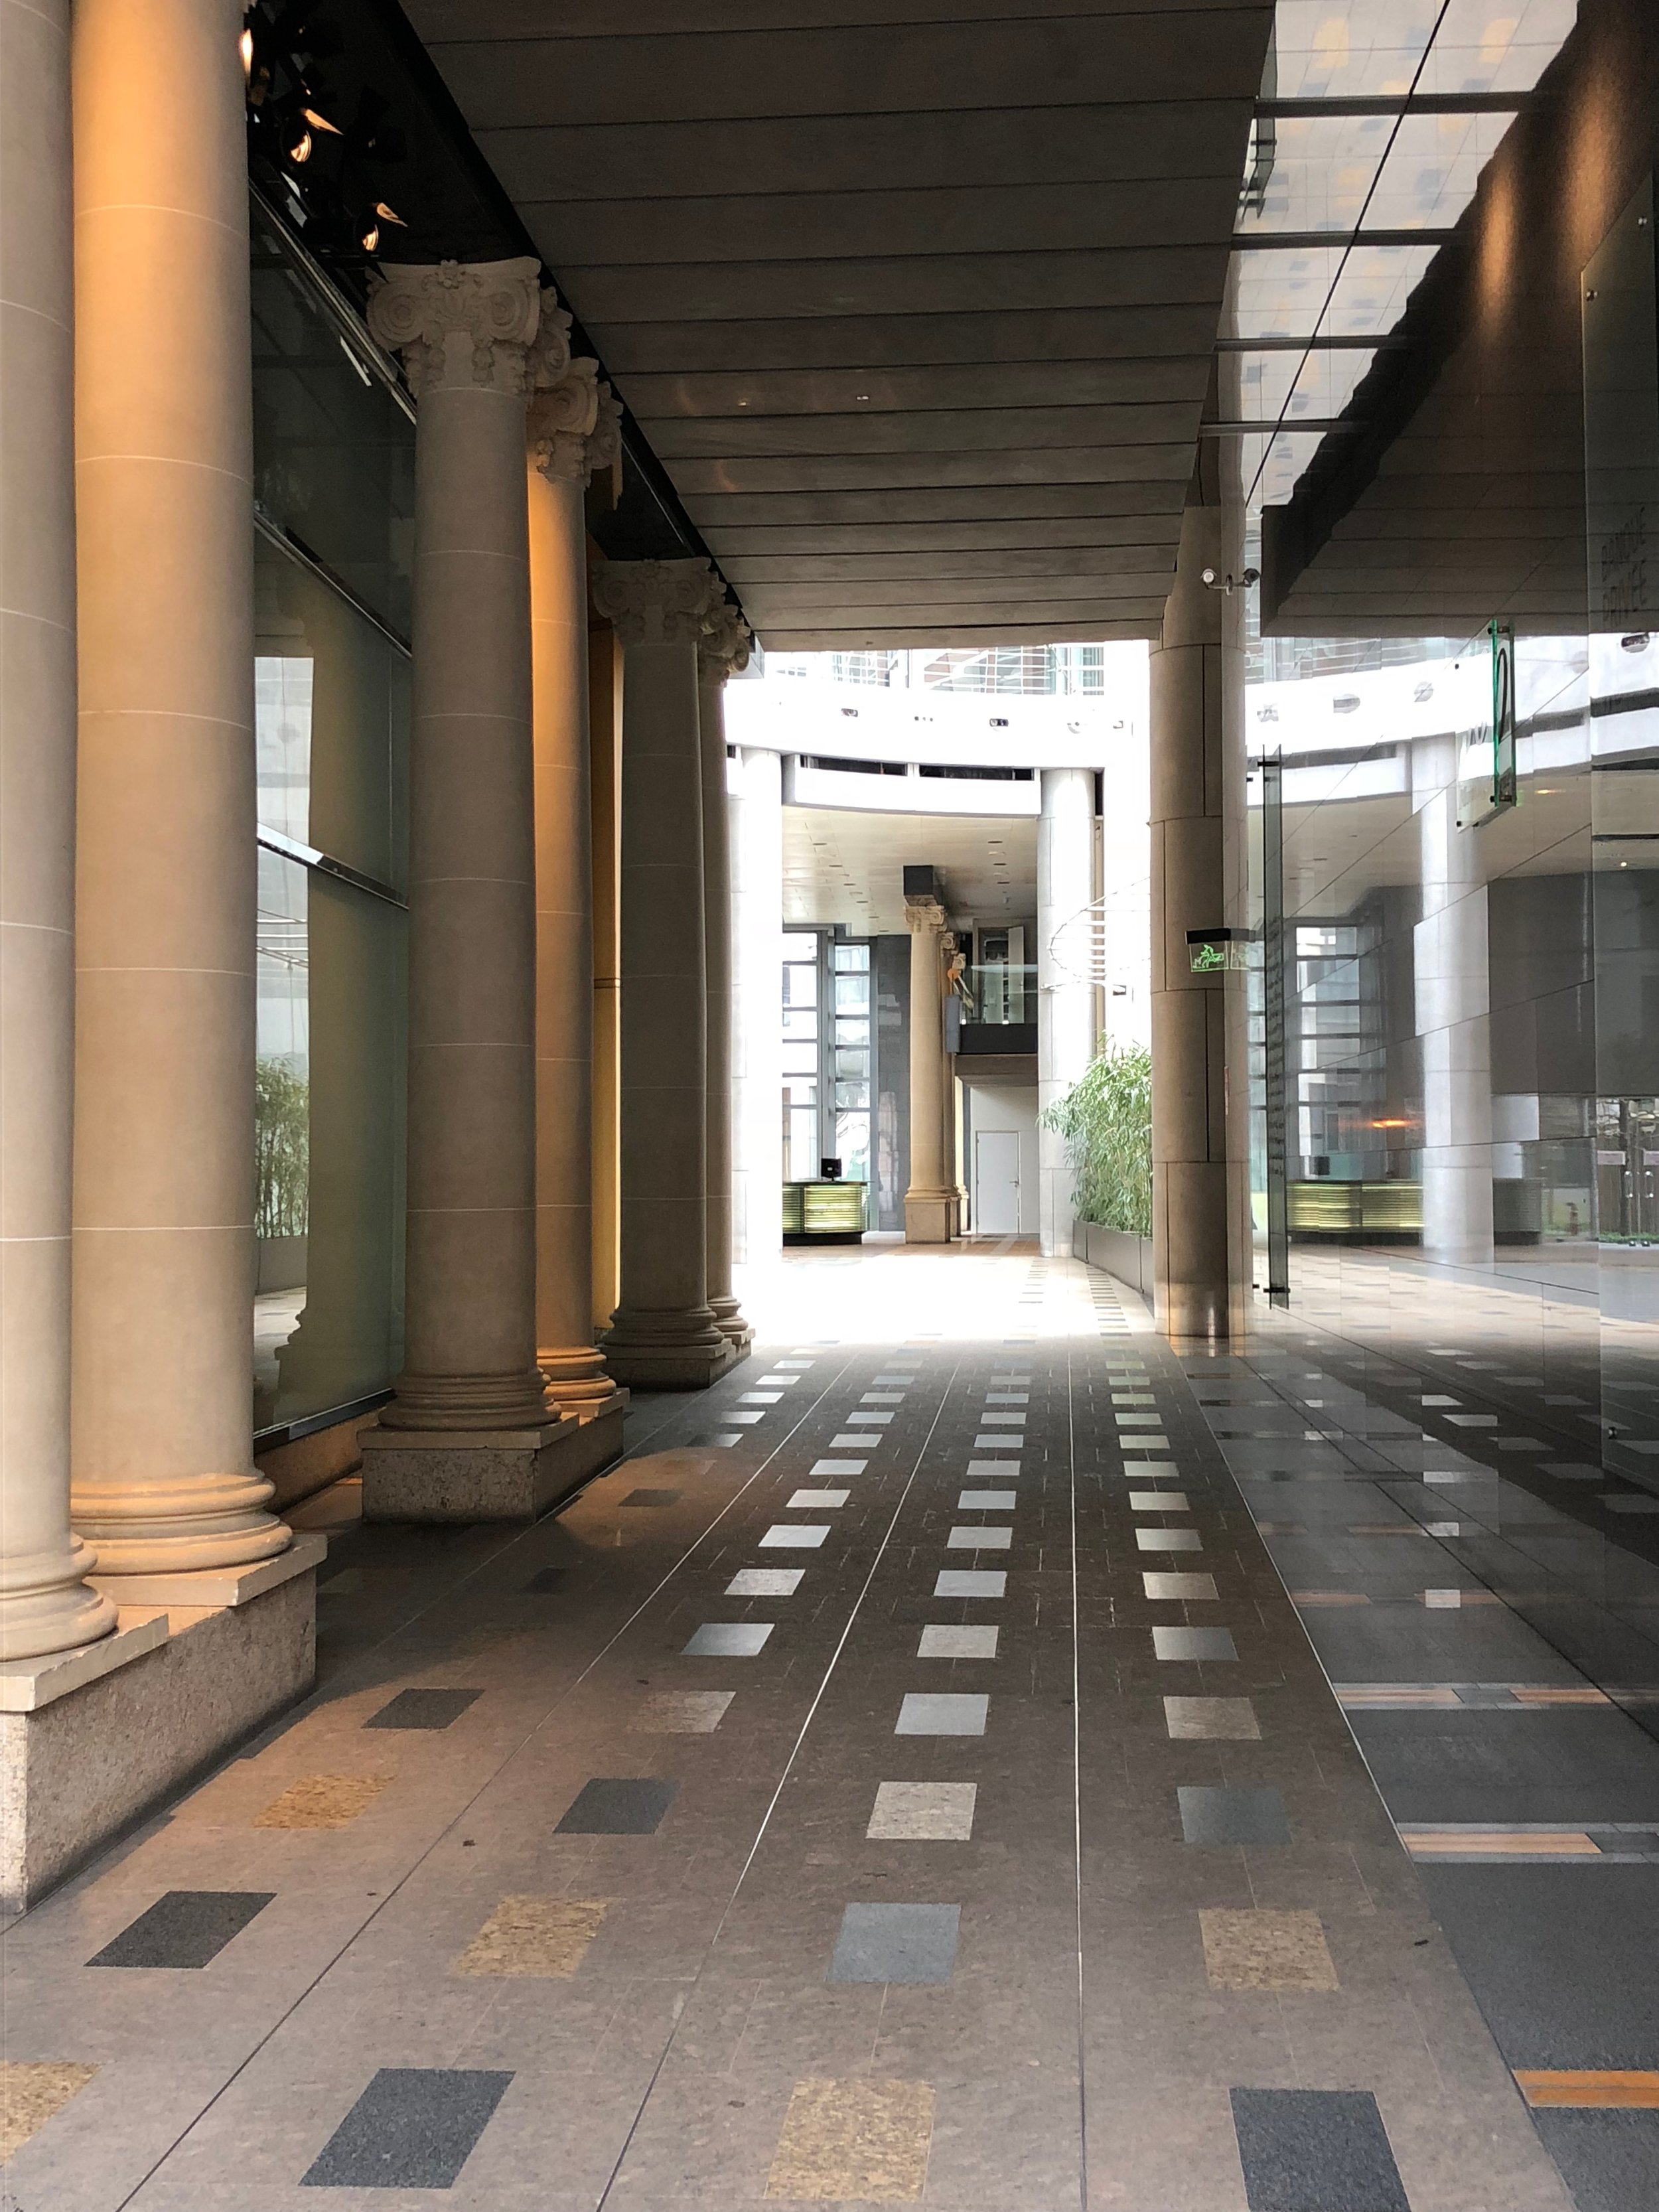 50 AVE MONTAIGNE w/ KPF Interior Architects